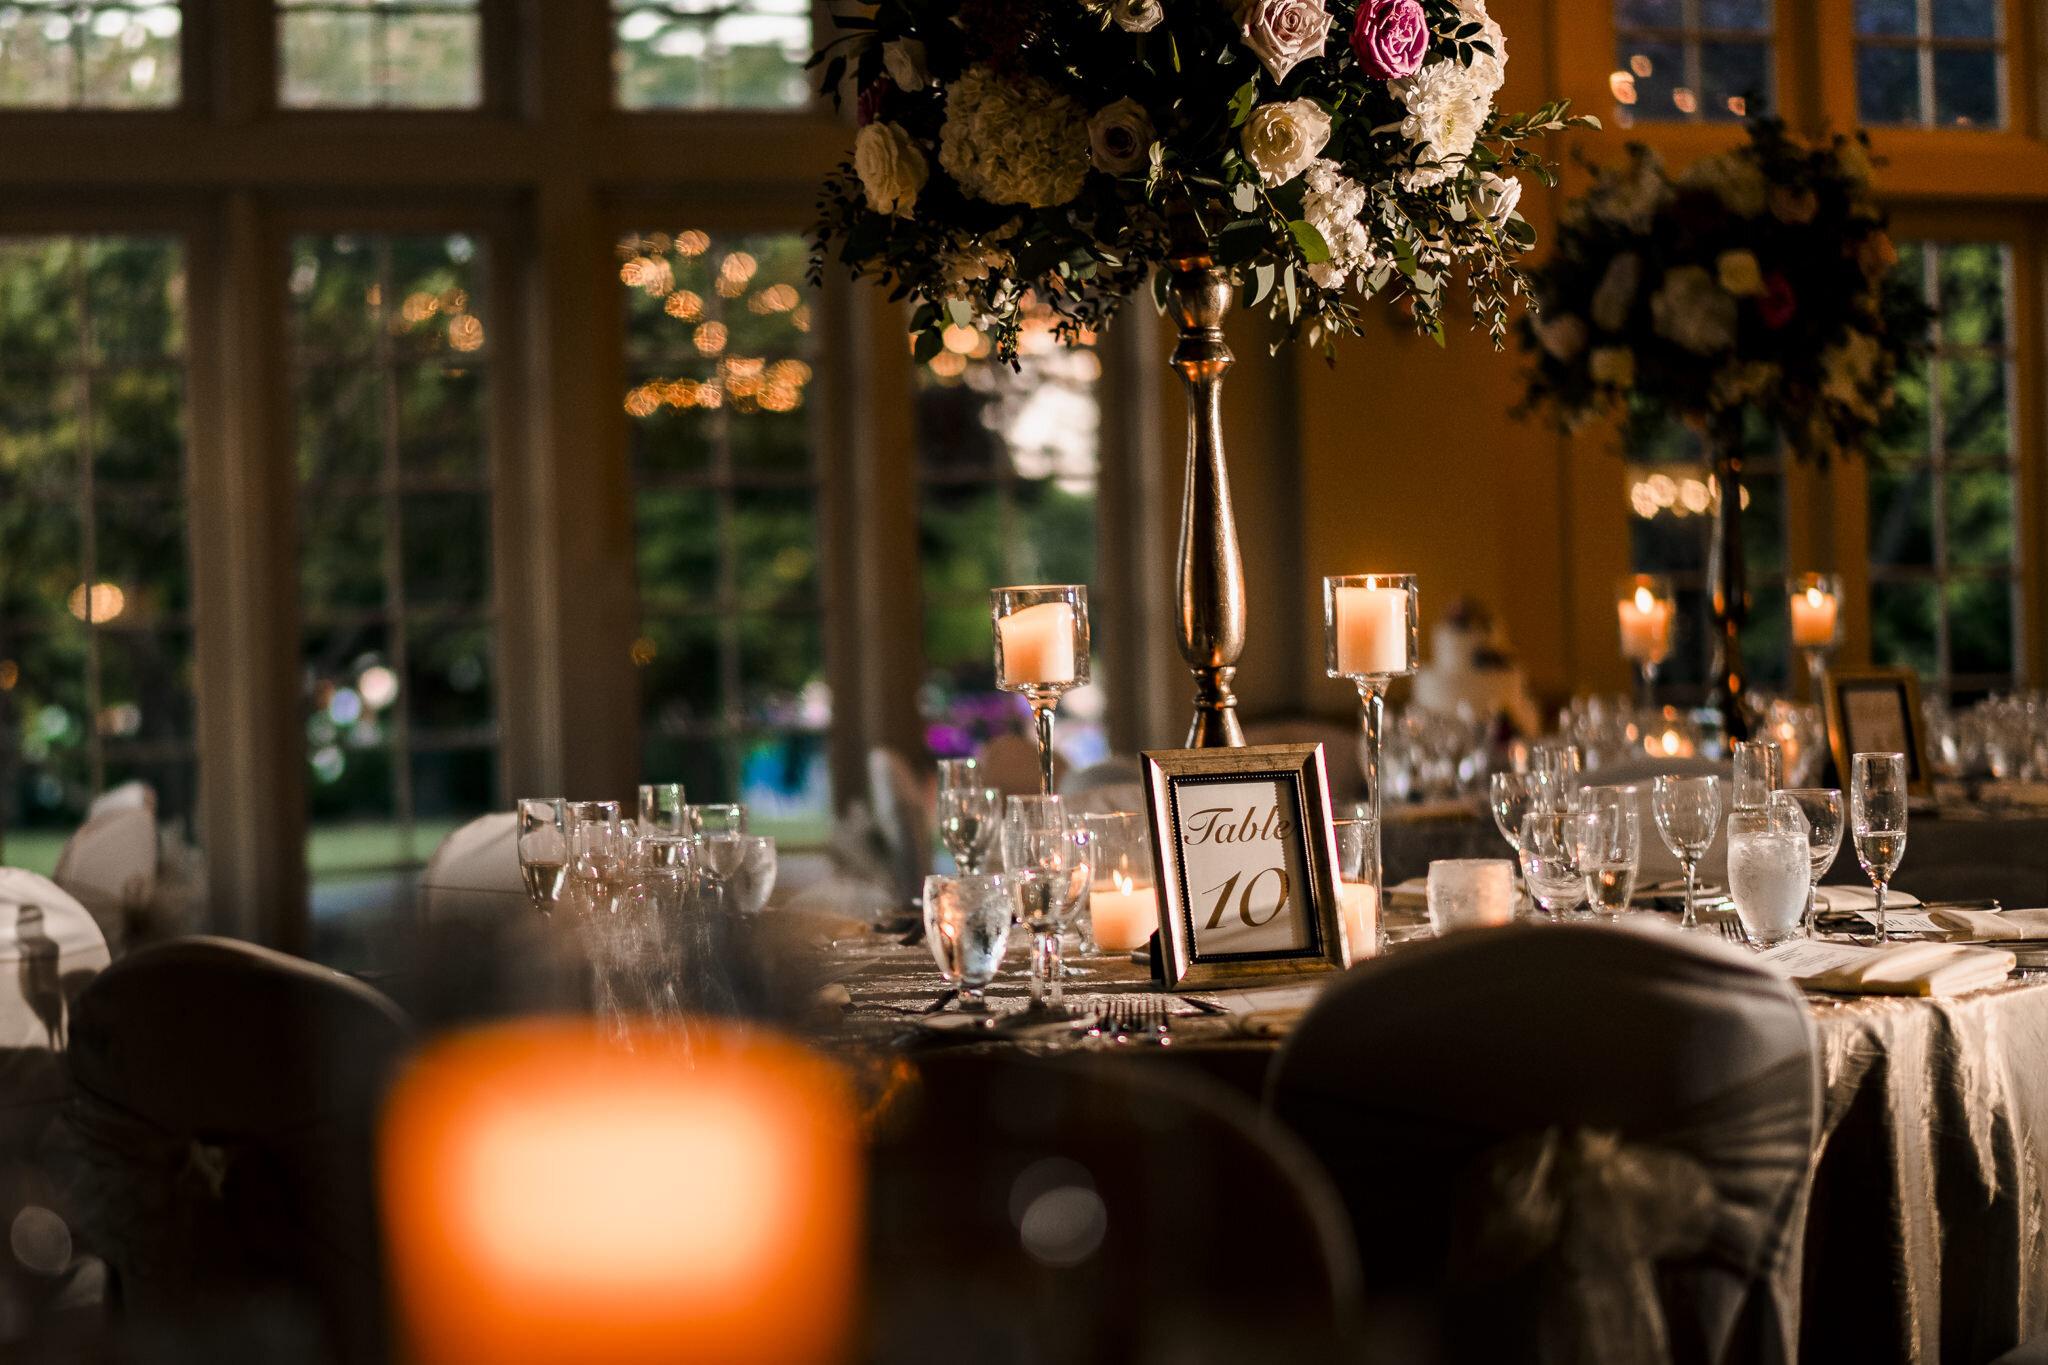 Coyle-Forsgate-Country-Club-Wedding-Photographer-36.JPG